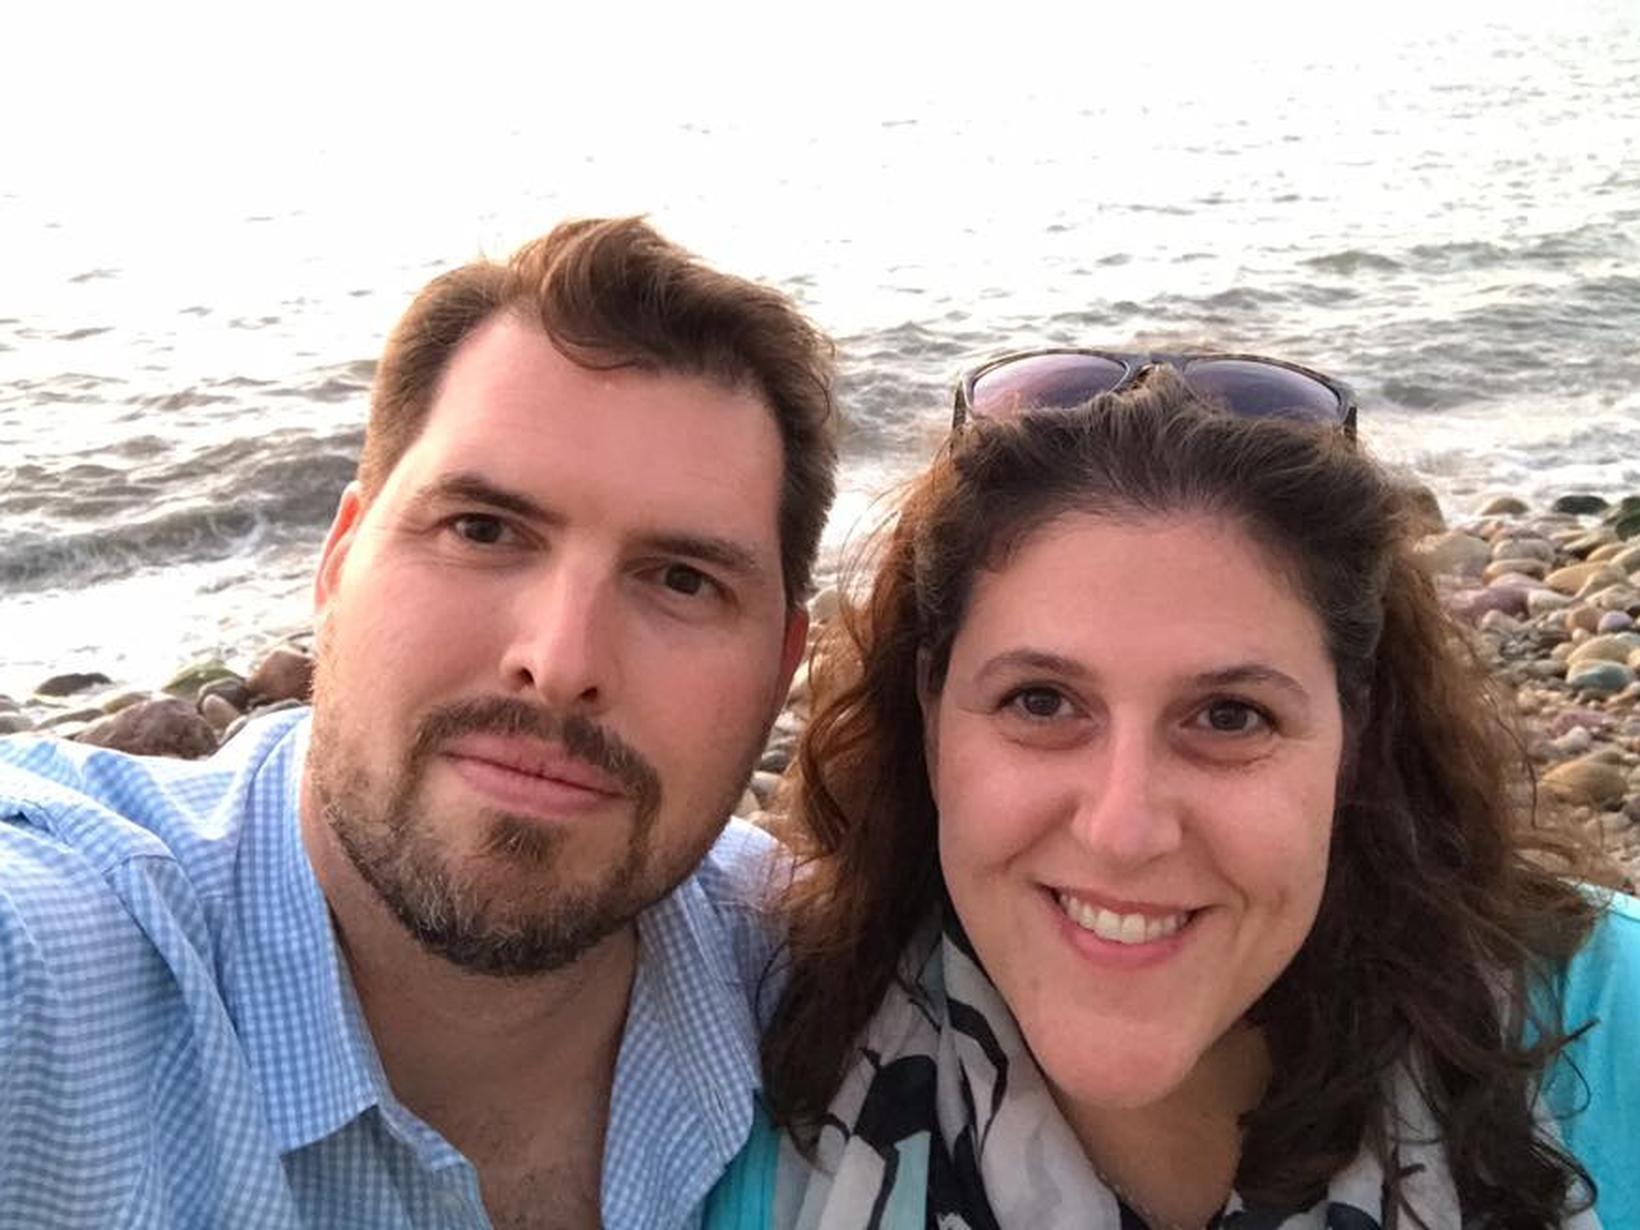 Susan & Patrick from Montréal, Quebec, Canada